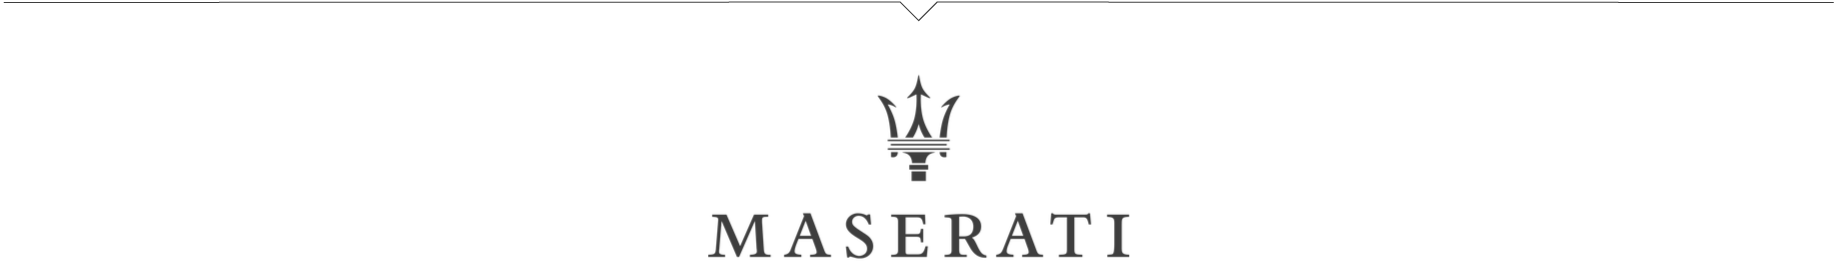 maserati-testimonial-image